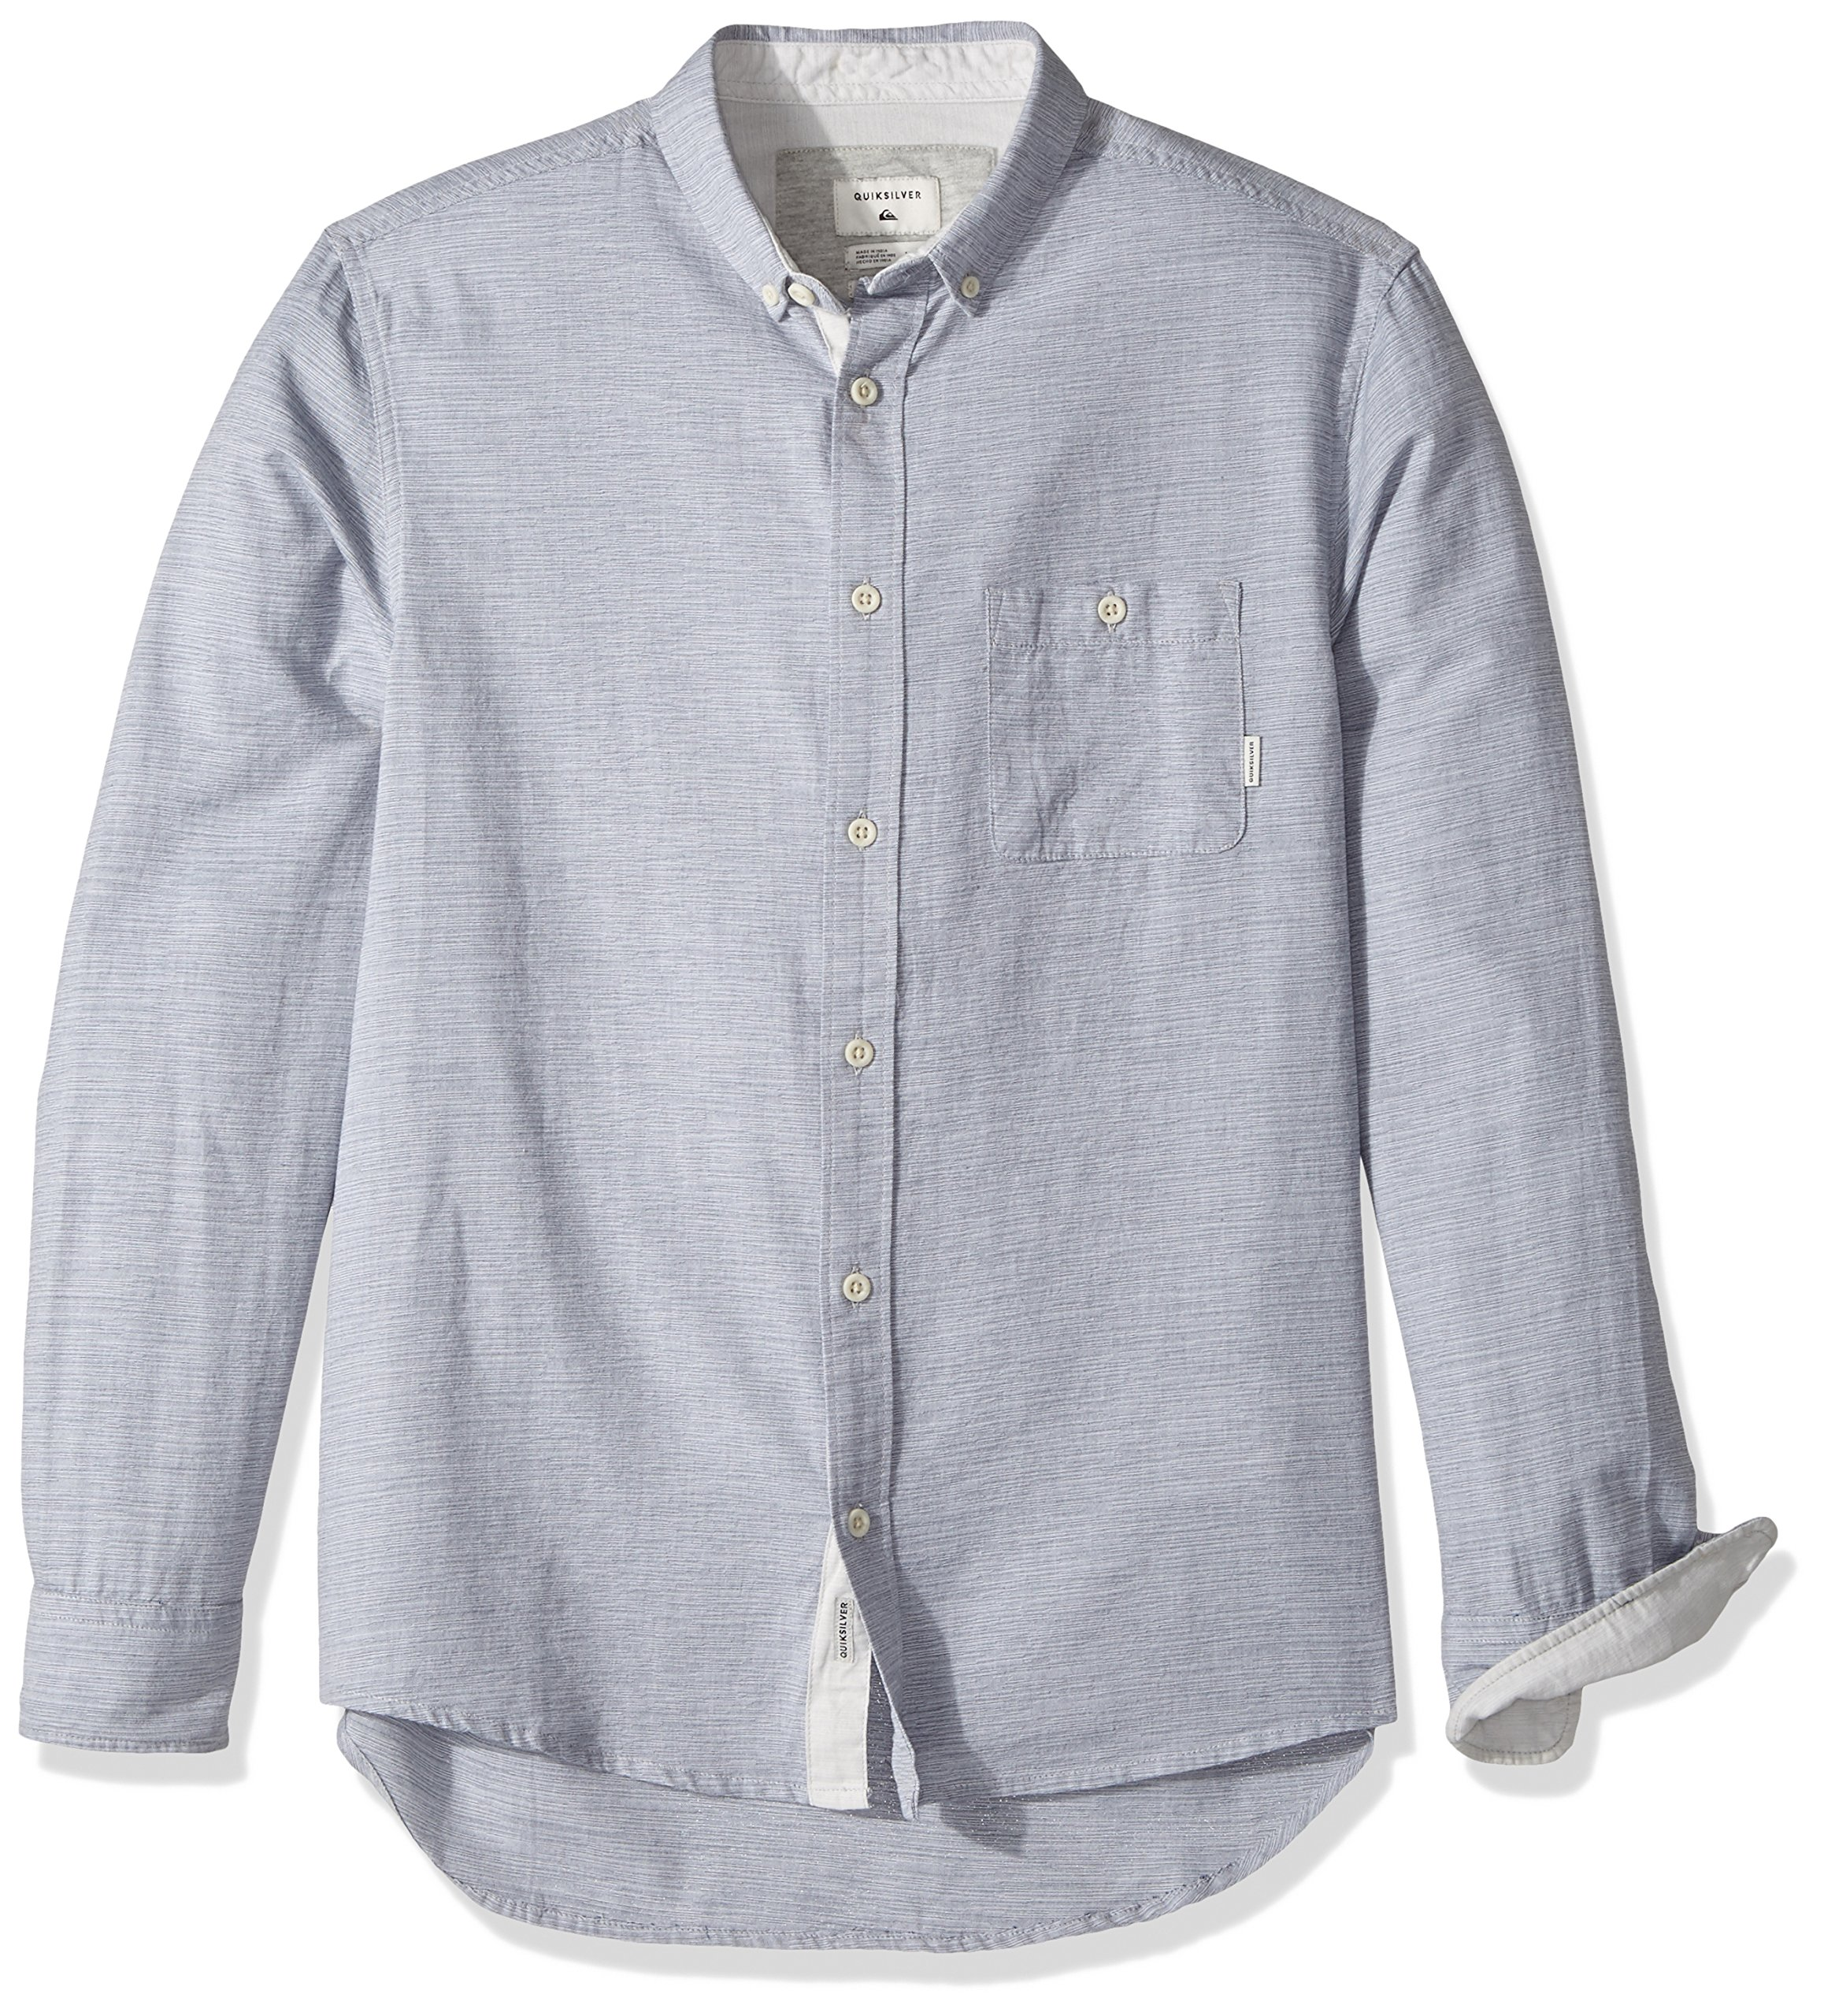 Quiksilver Men's Waterfalls Long Sleeve Shirt, Dark Denim, Large